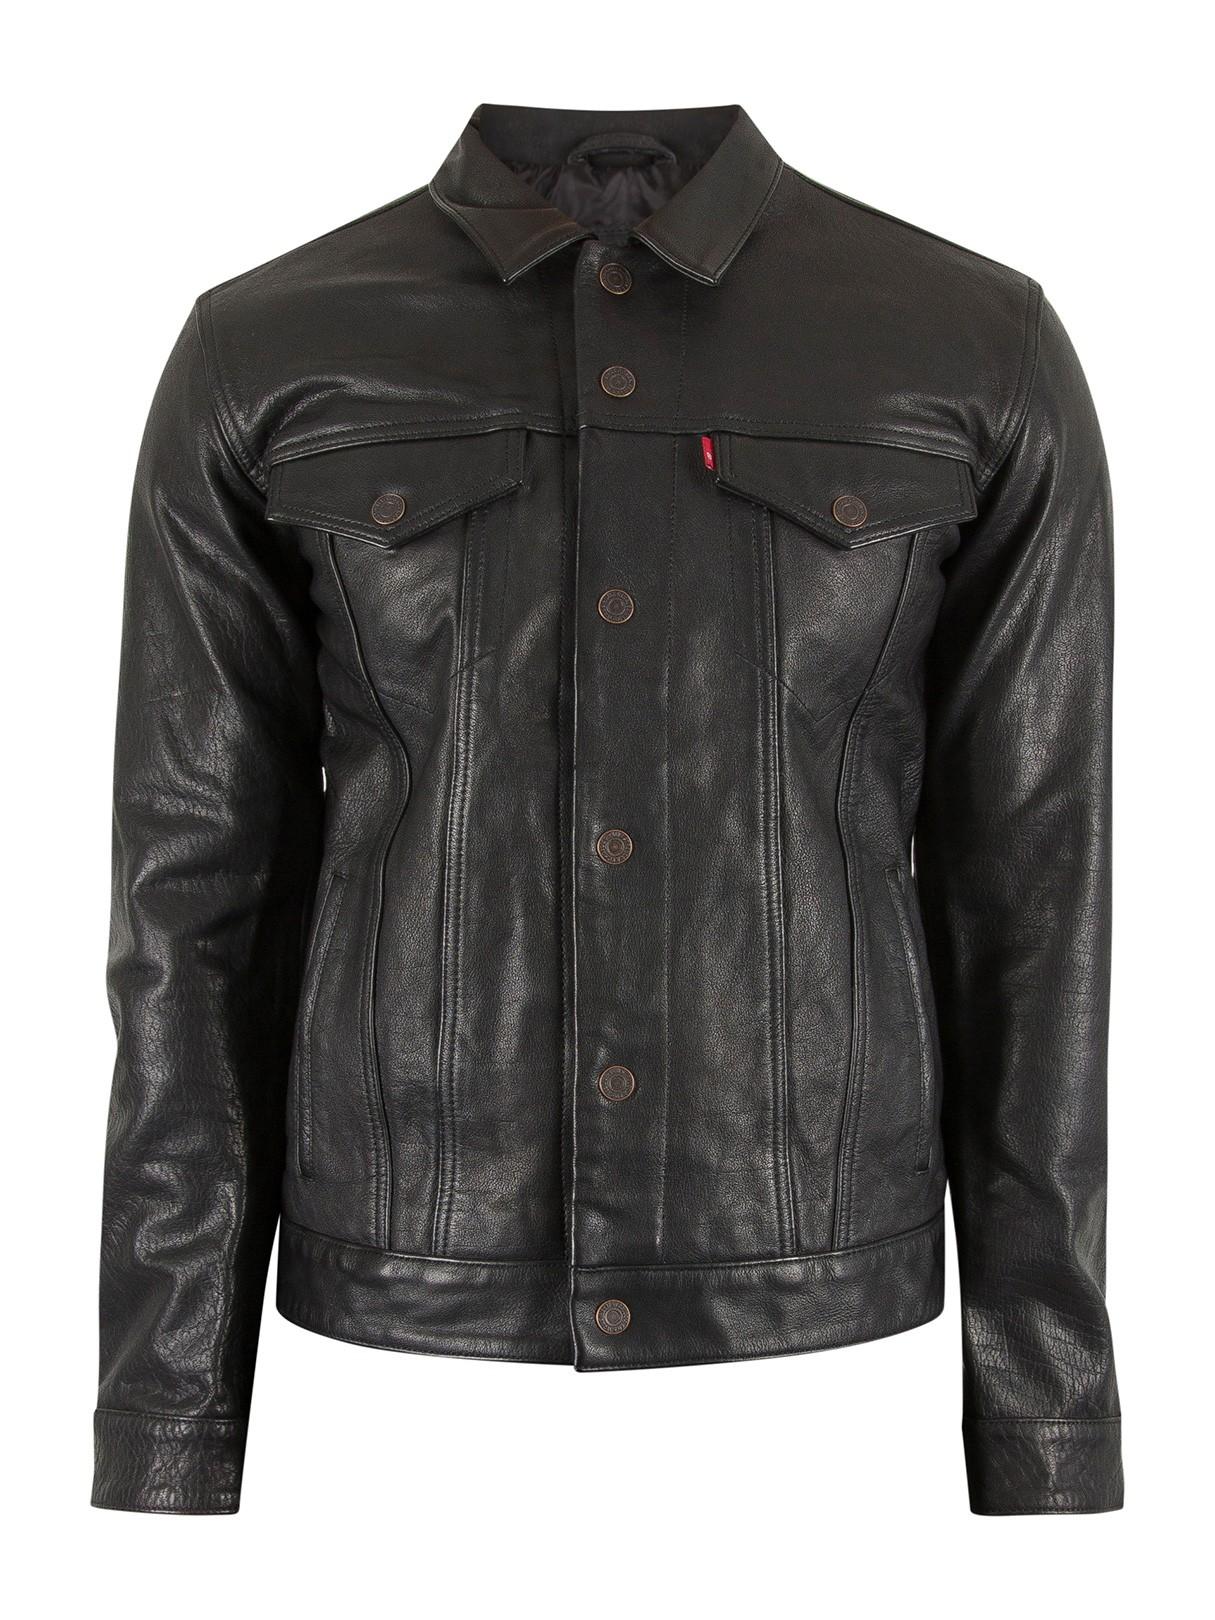 Levi's Men's Buffalo Leather Trucker Jacket, Black